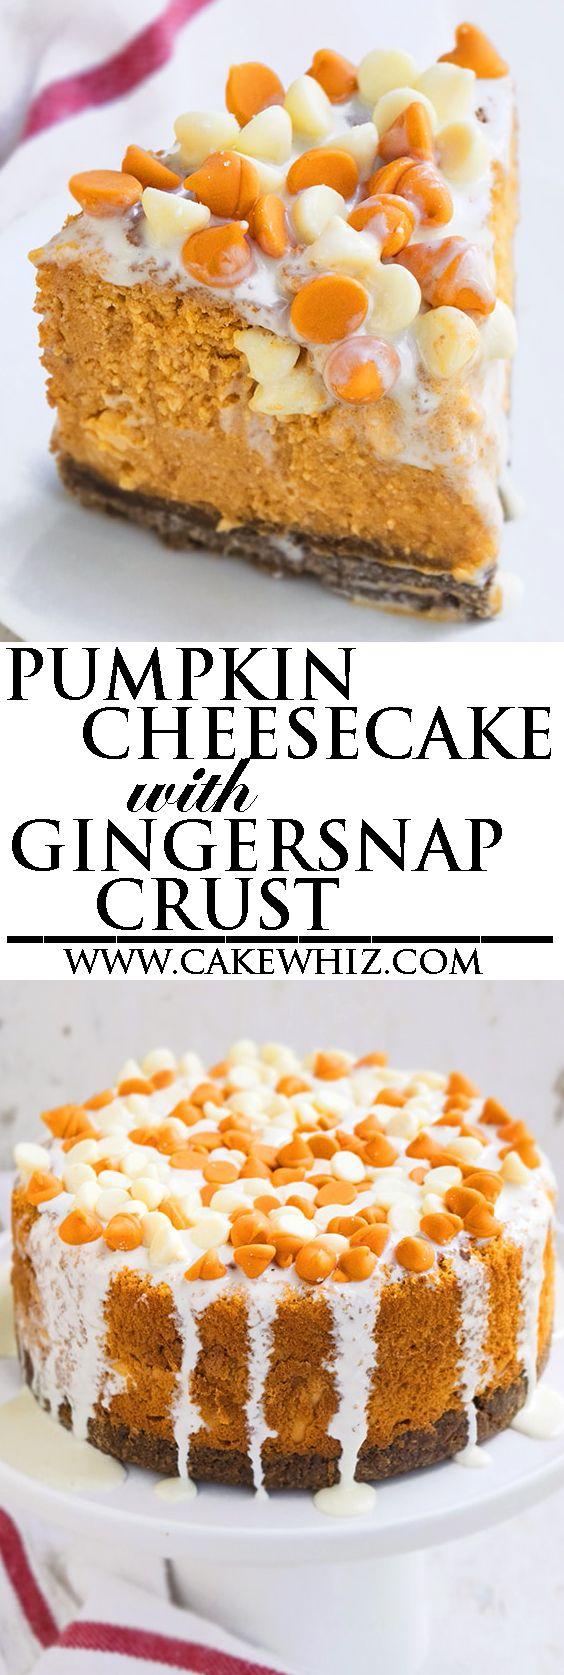 Best 25+ Gingersnap crust ideas on Pinterest | Eggnog cheesecake ...